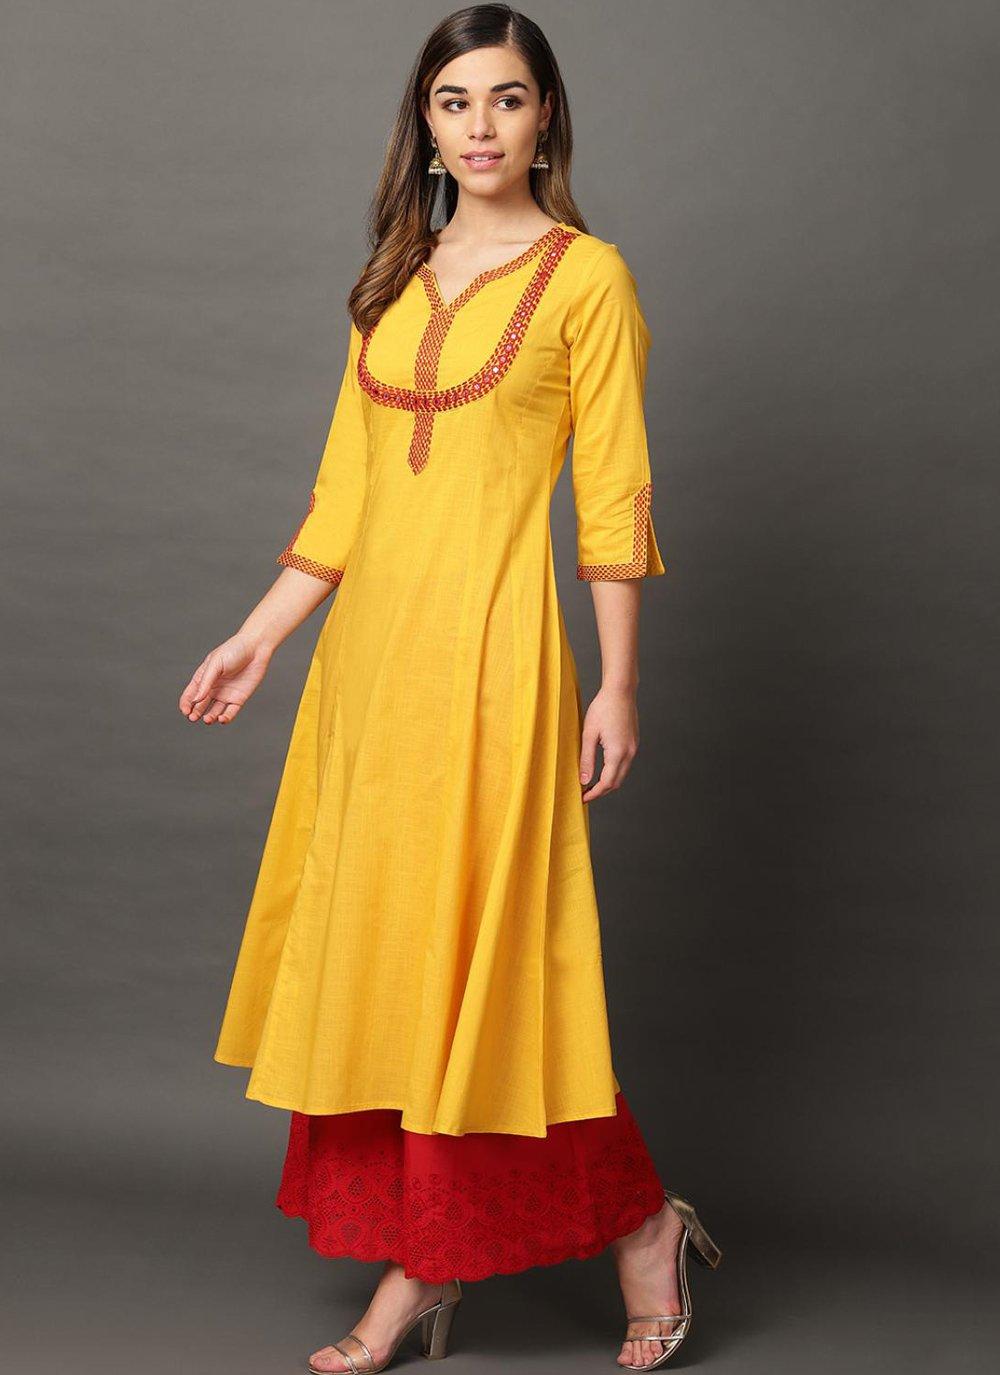 Embroidered Yellow Rayon Casual Kurti